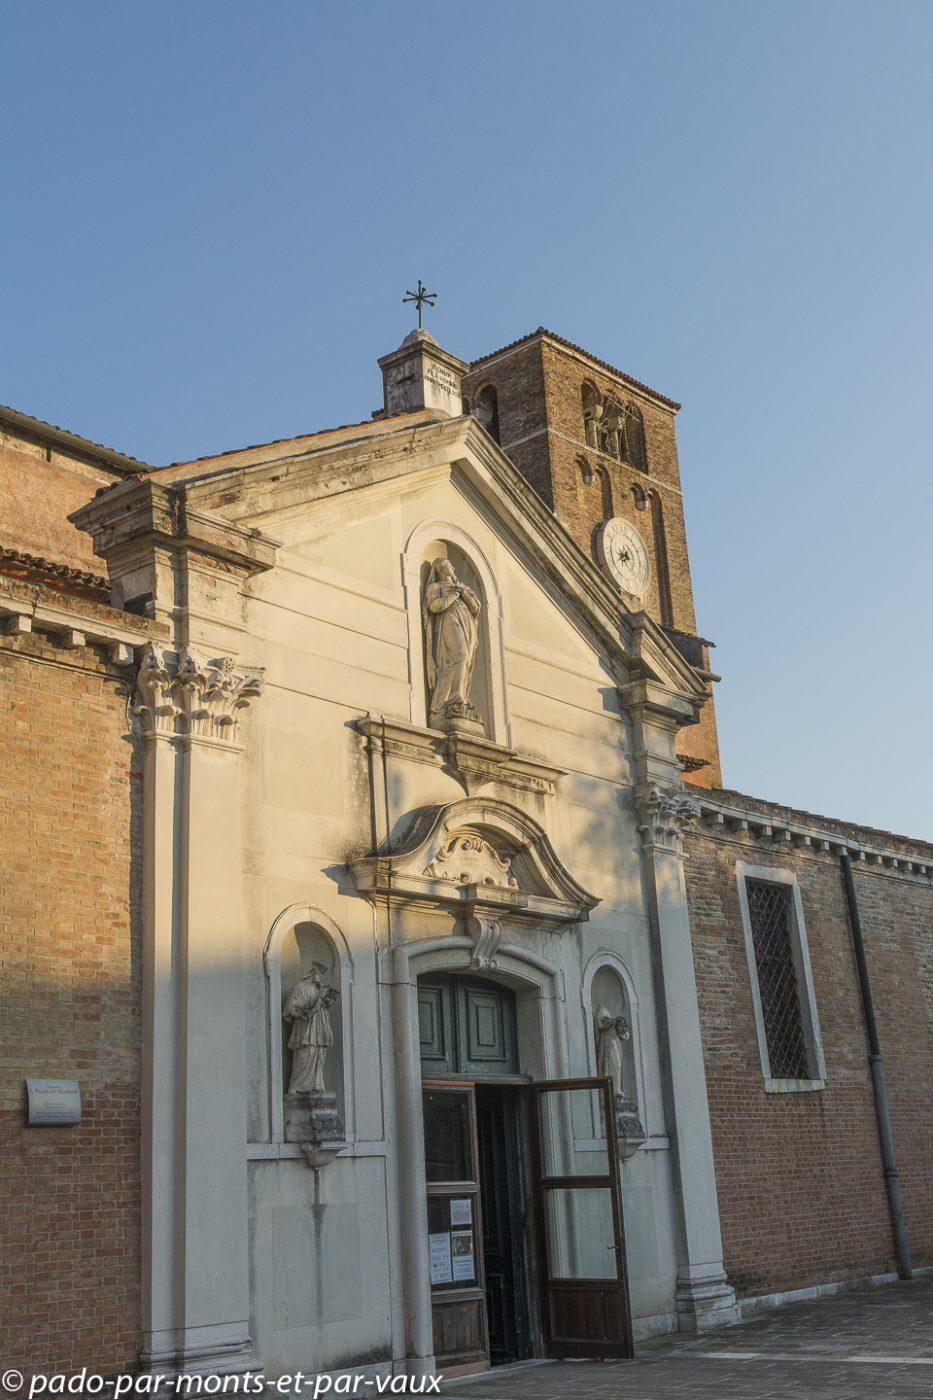 Venise - Dorsoduro - Eglise san Nicolo dei Mendicoli